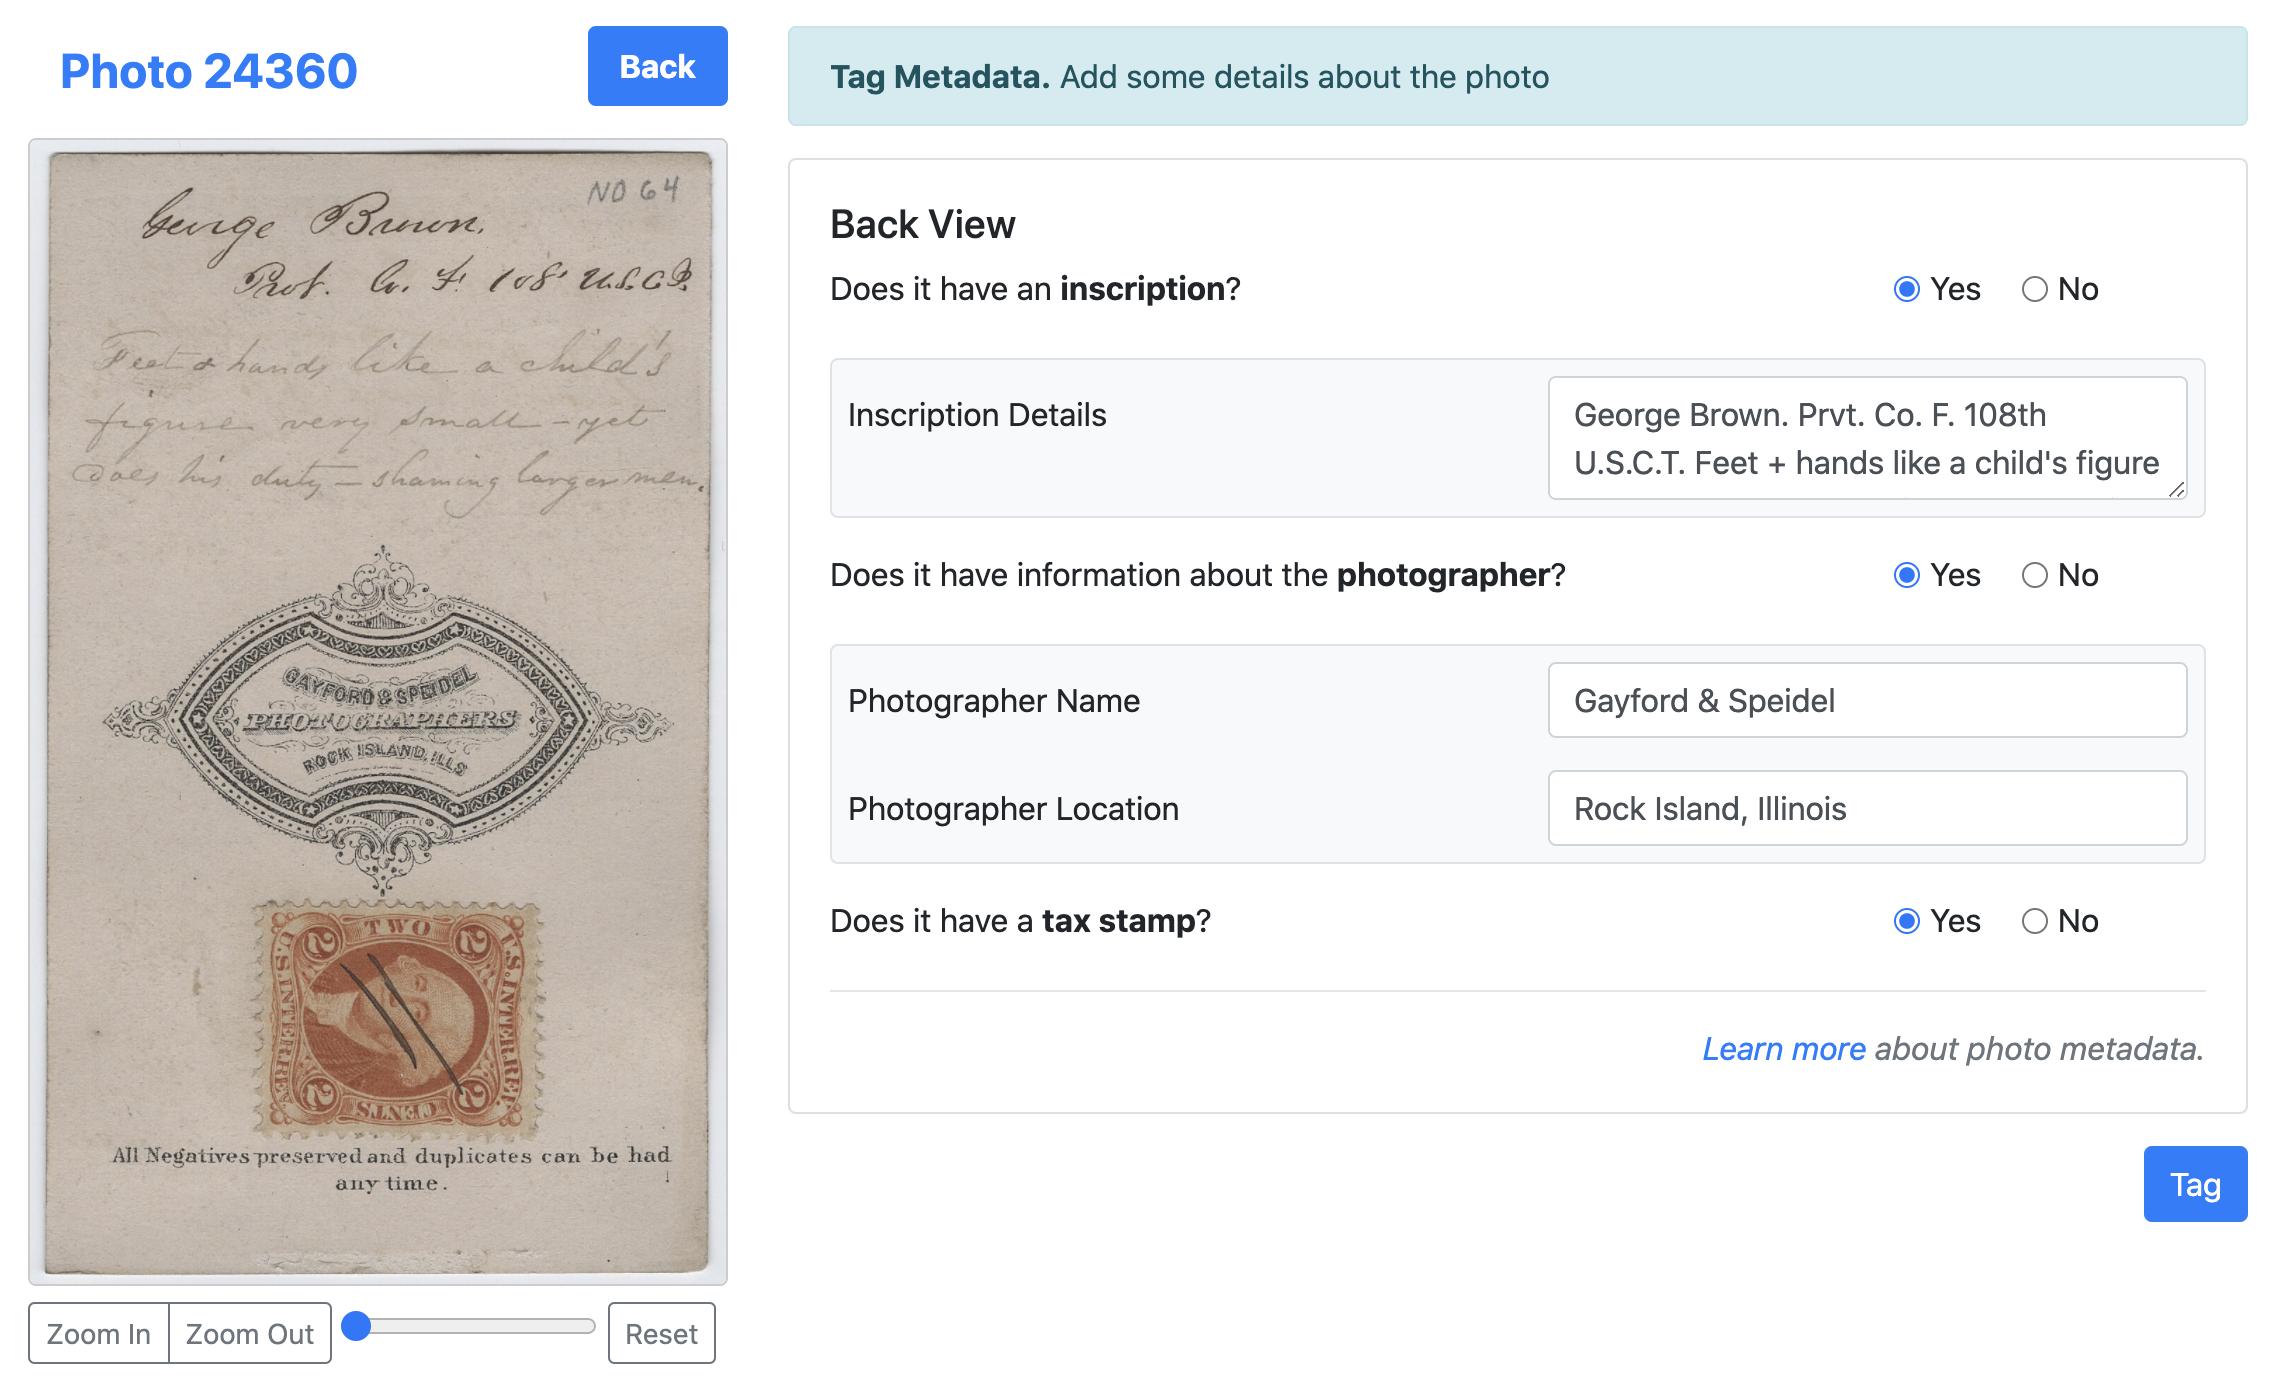 Metadata (Back View)